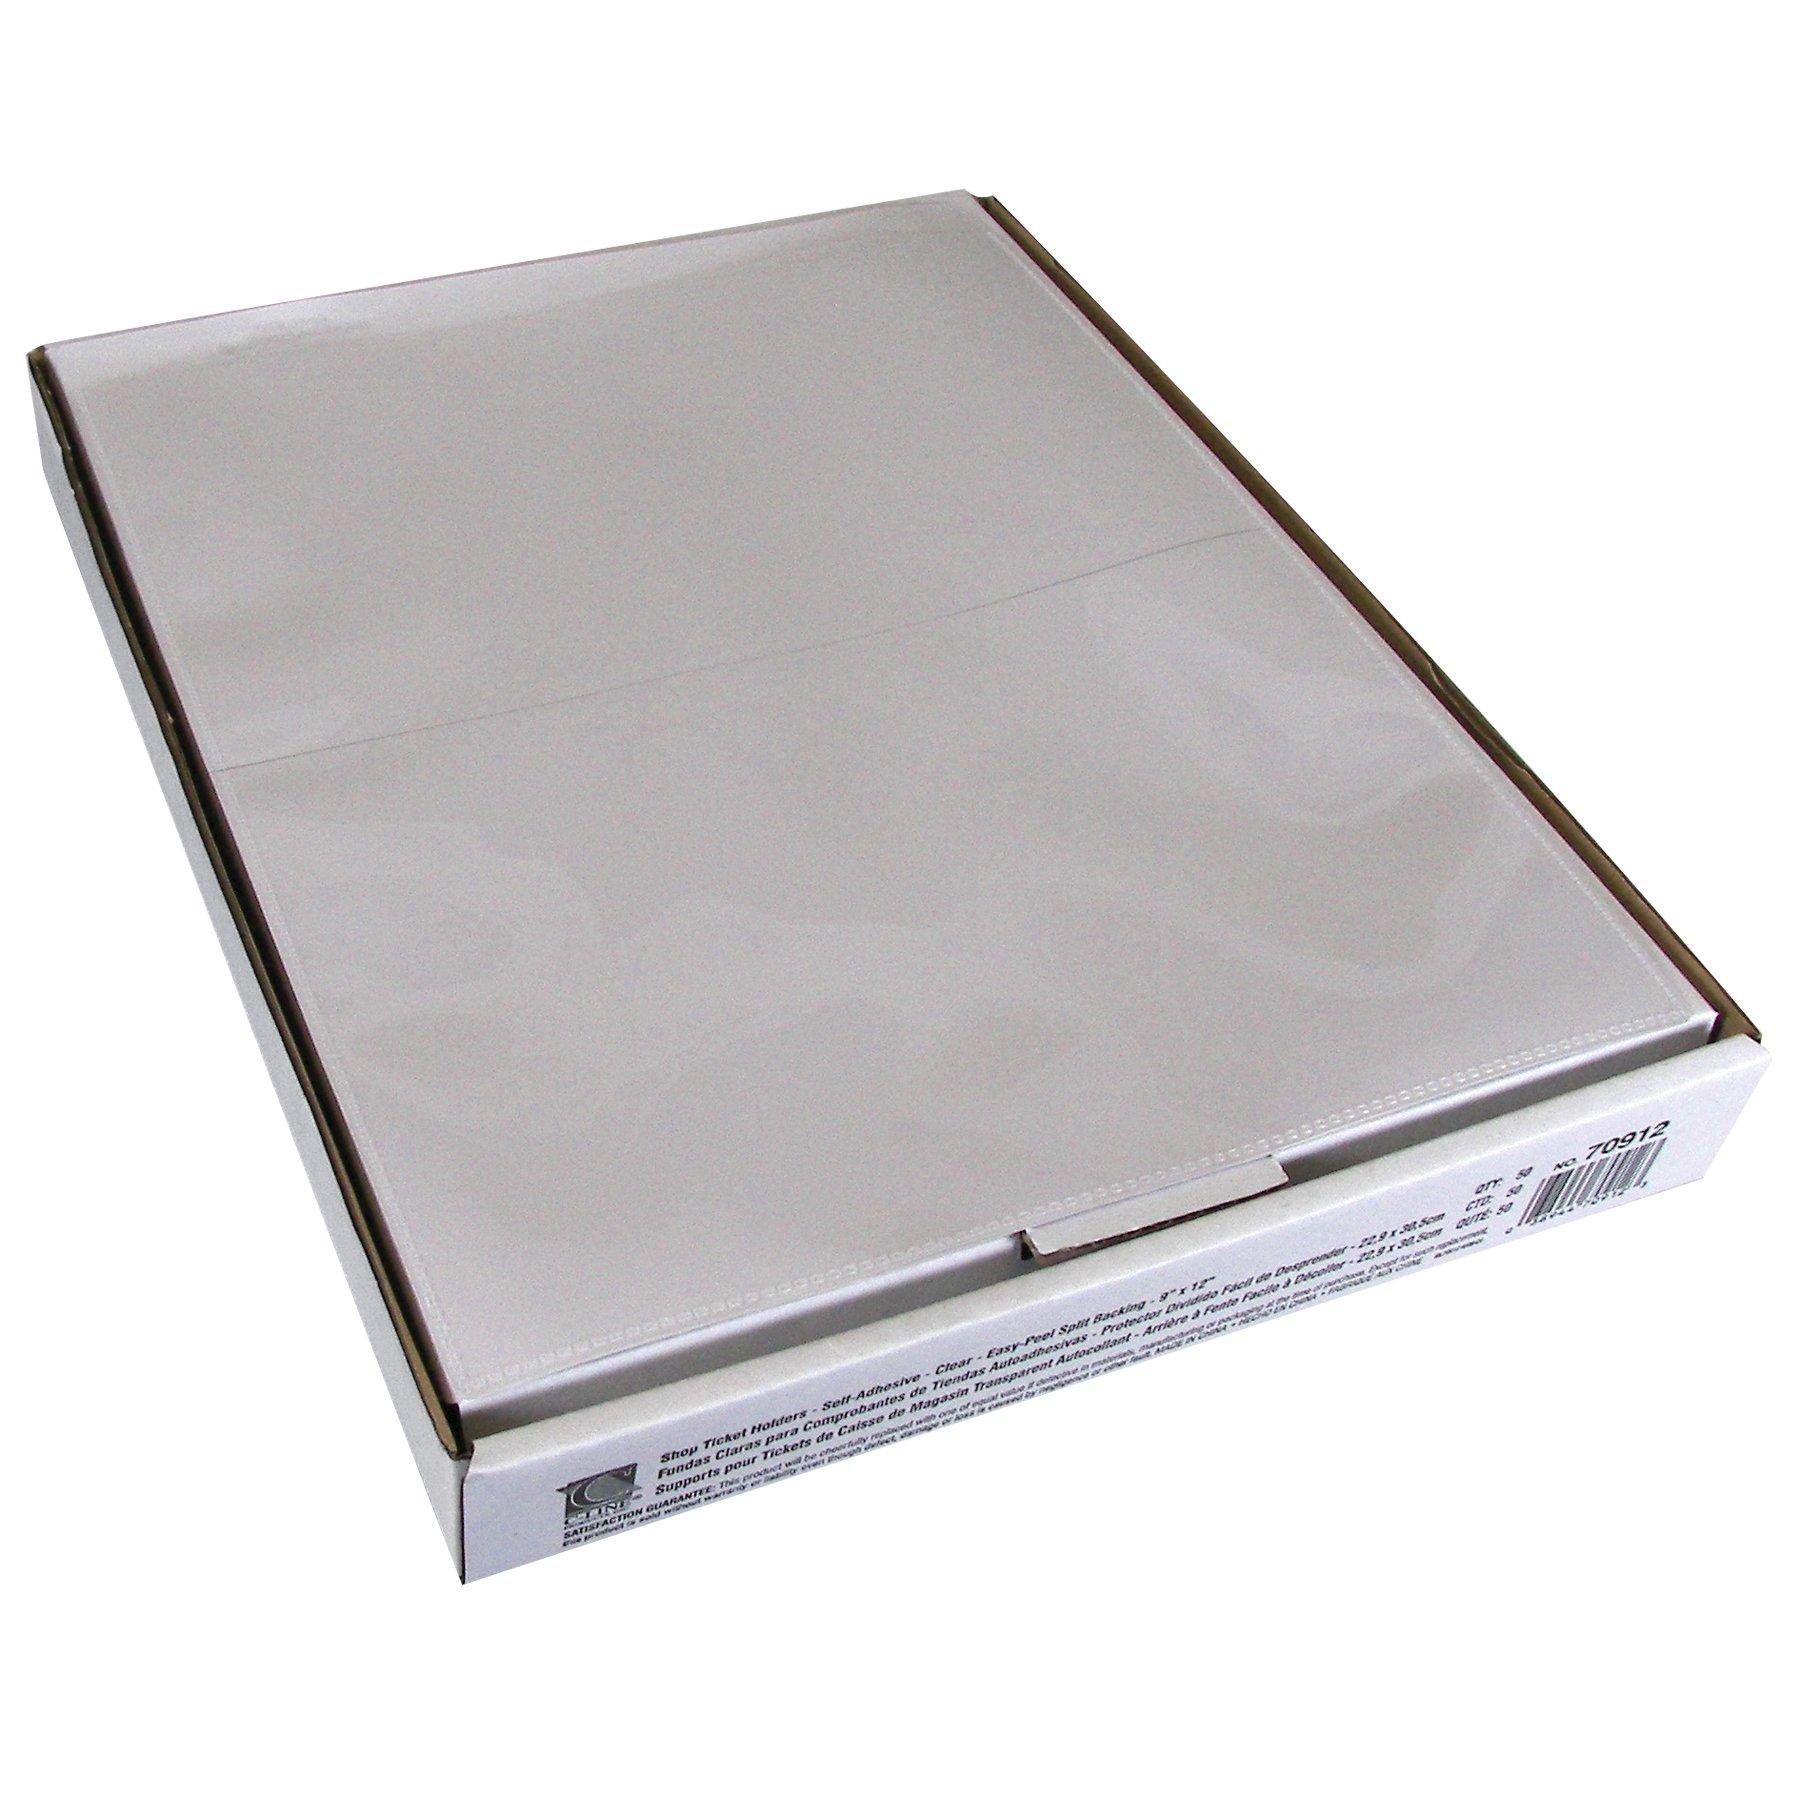 C-Line 70912 Self-Adhesive Shop Ticket Holders, Heavy, 50'', 9 x 12 (Box of 50)